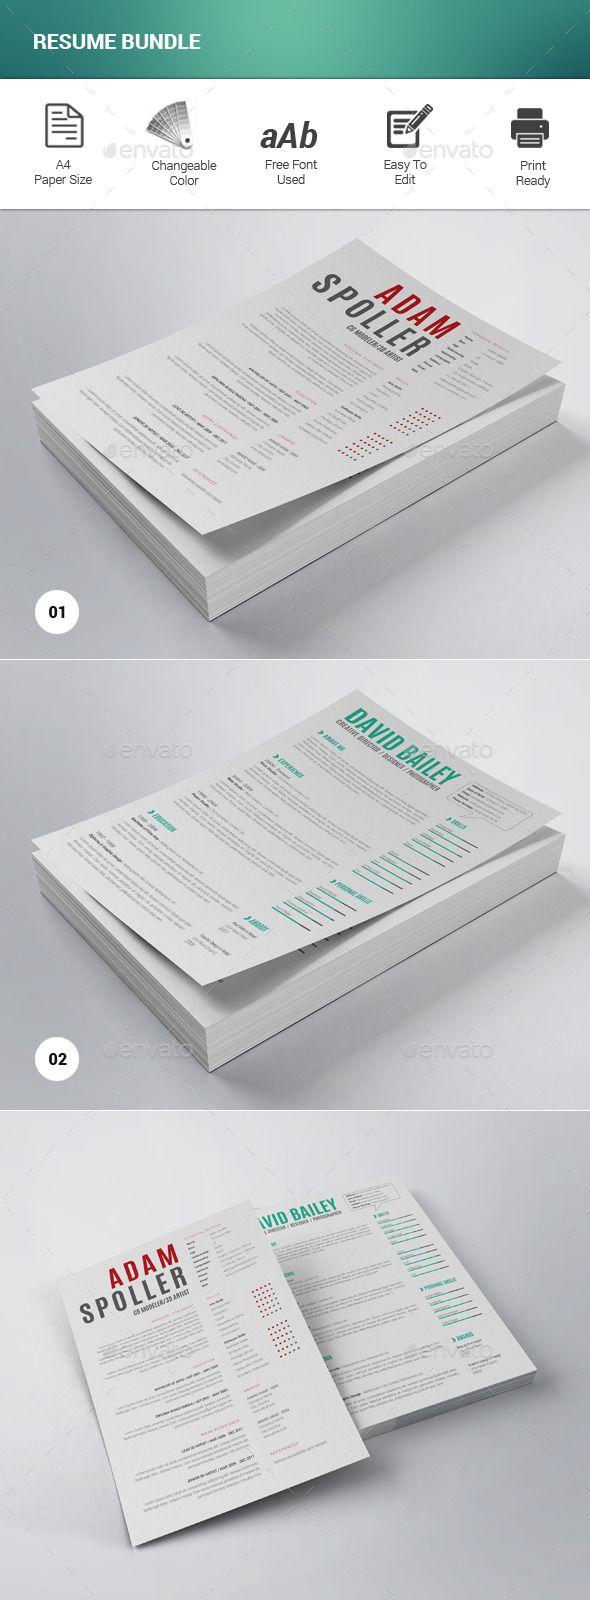 107 best recherche d emploi images on pinterest resume design